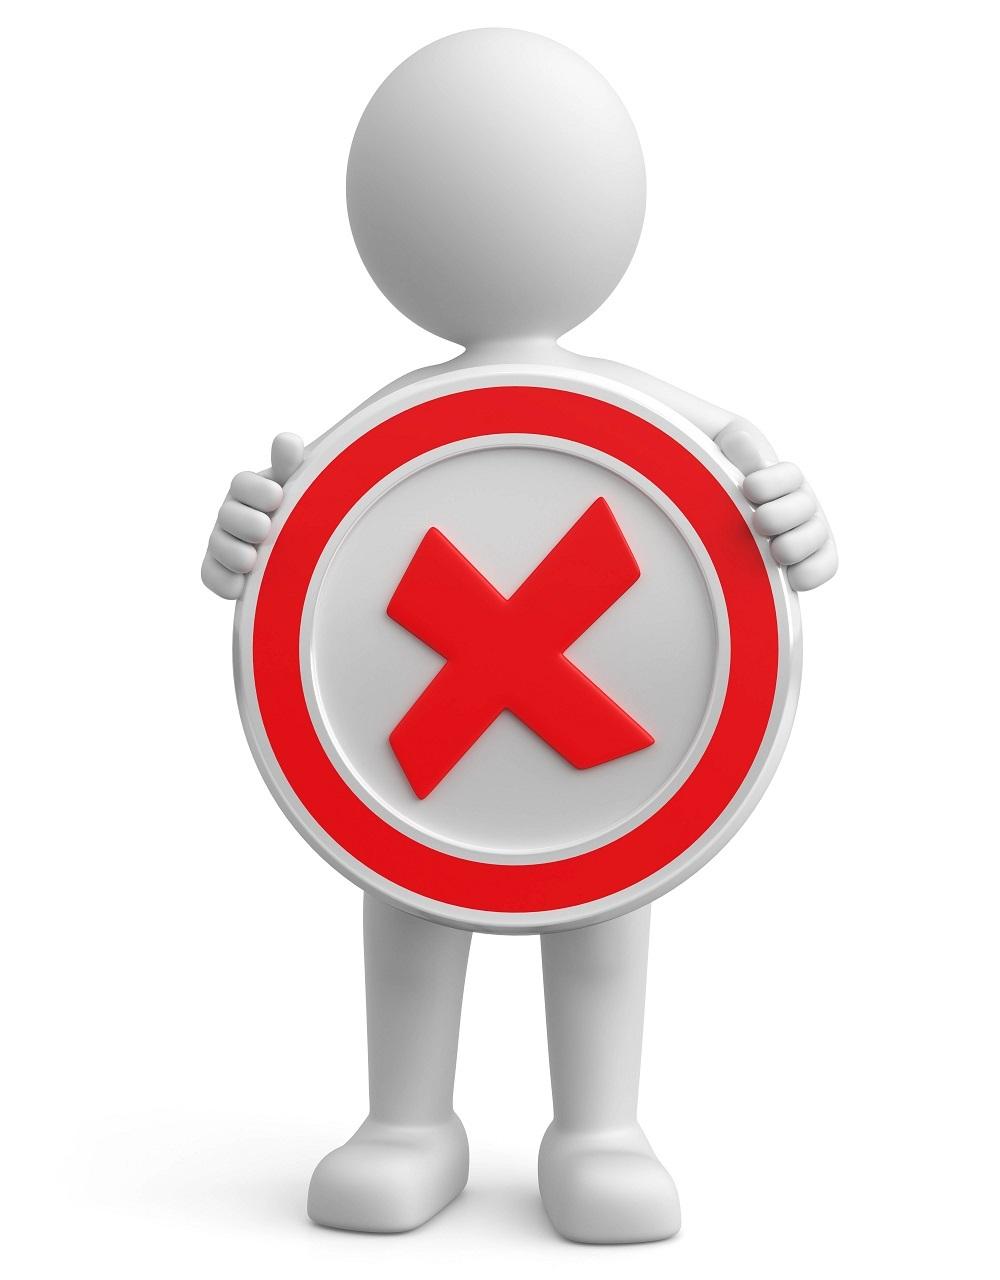 Parliament rejects criteria for endocrine disruptors